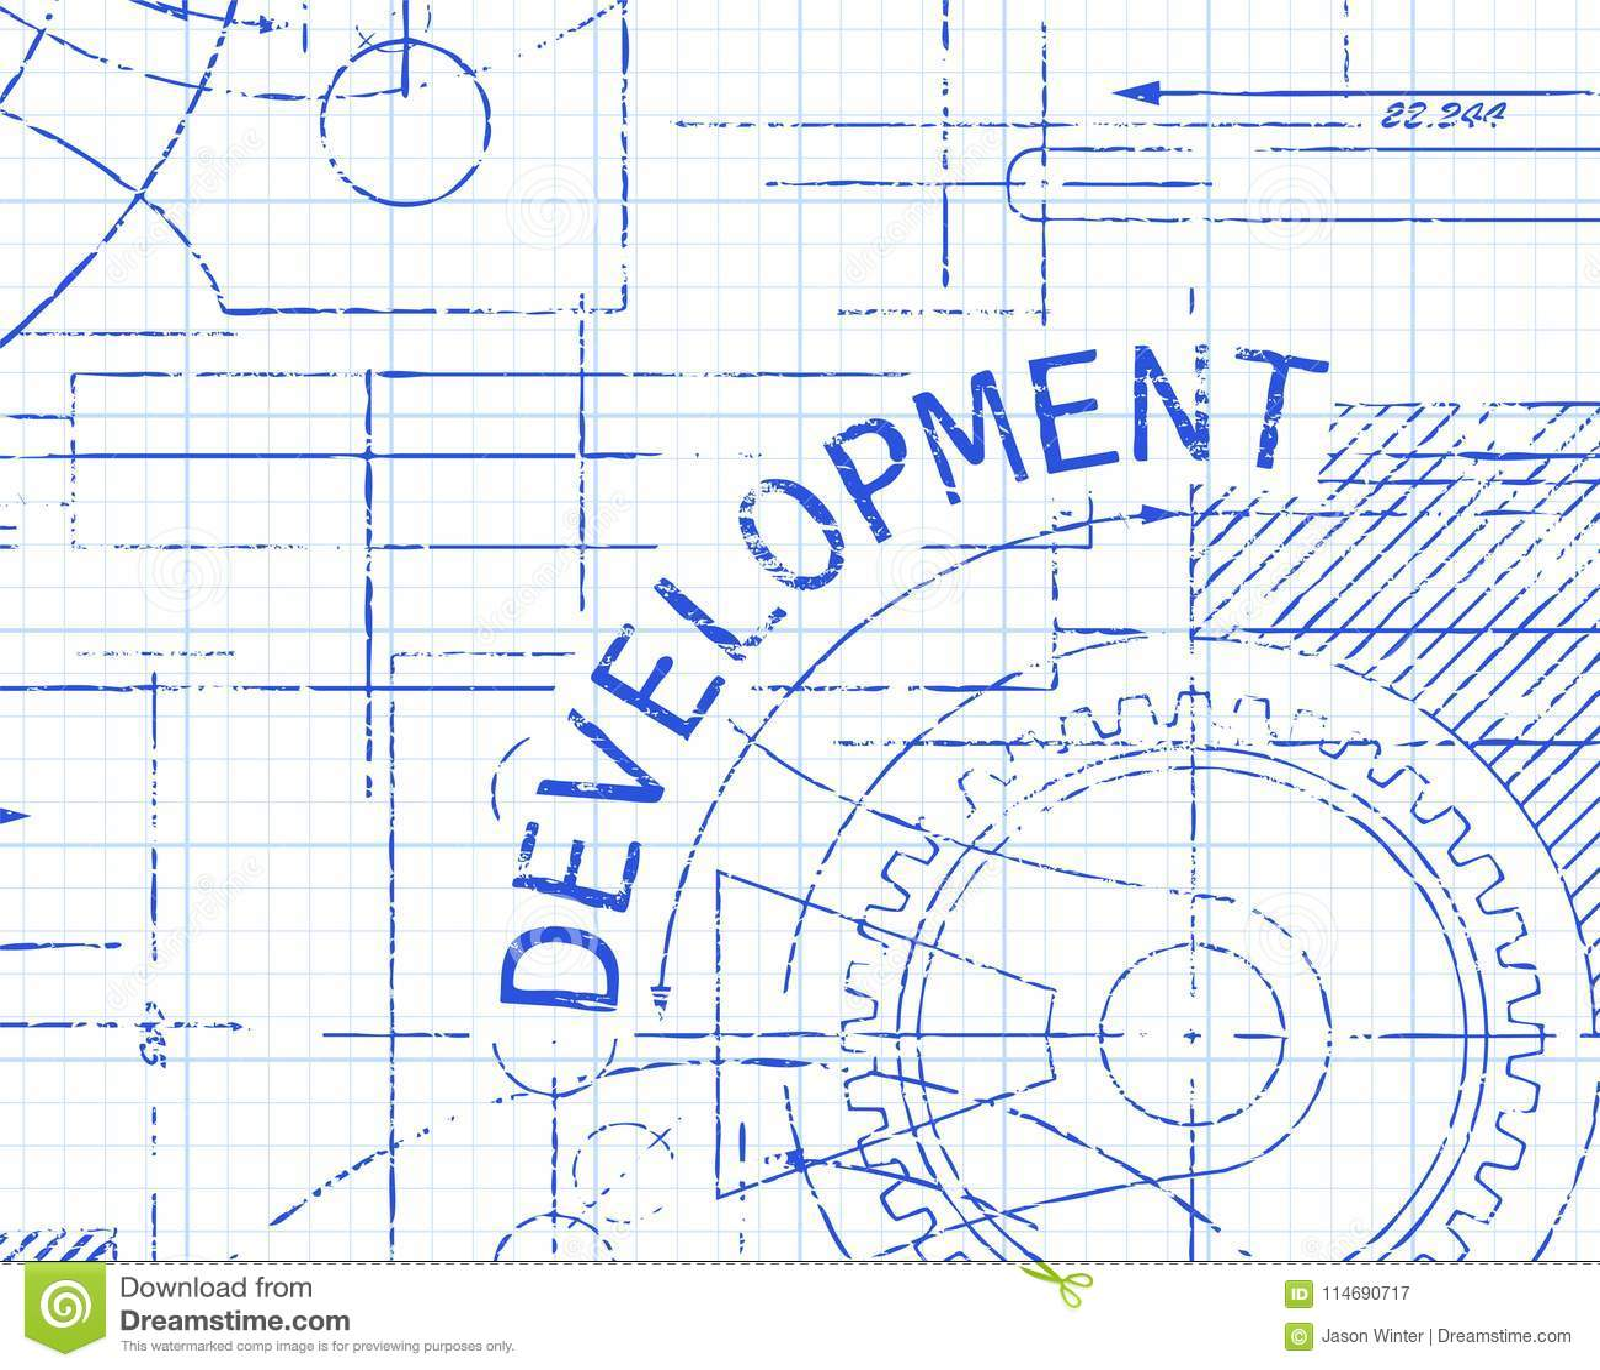 development graph paper machine stock vector illustration of